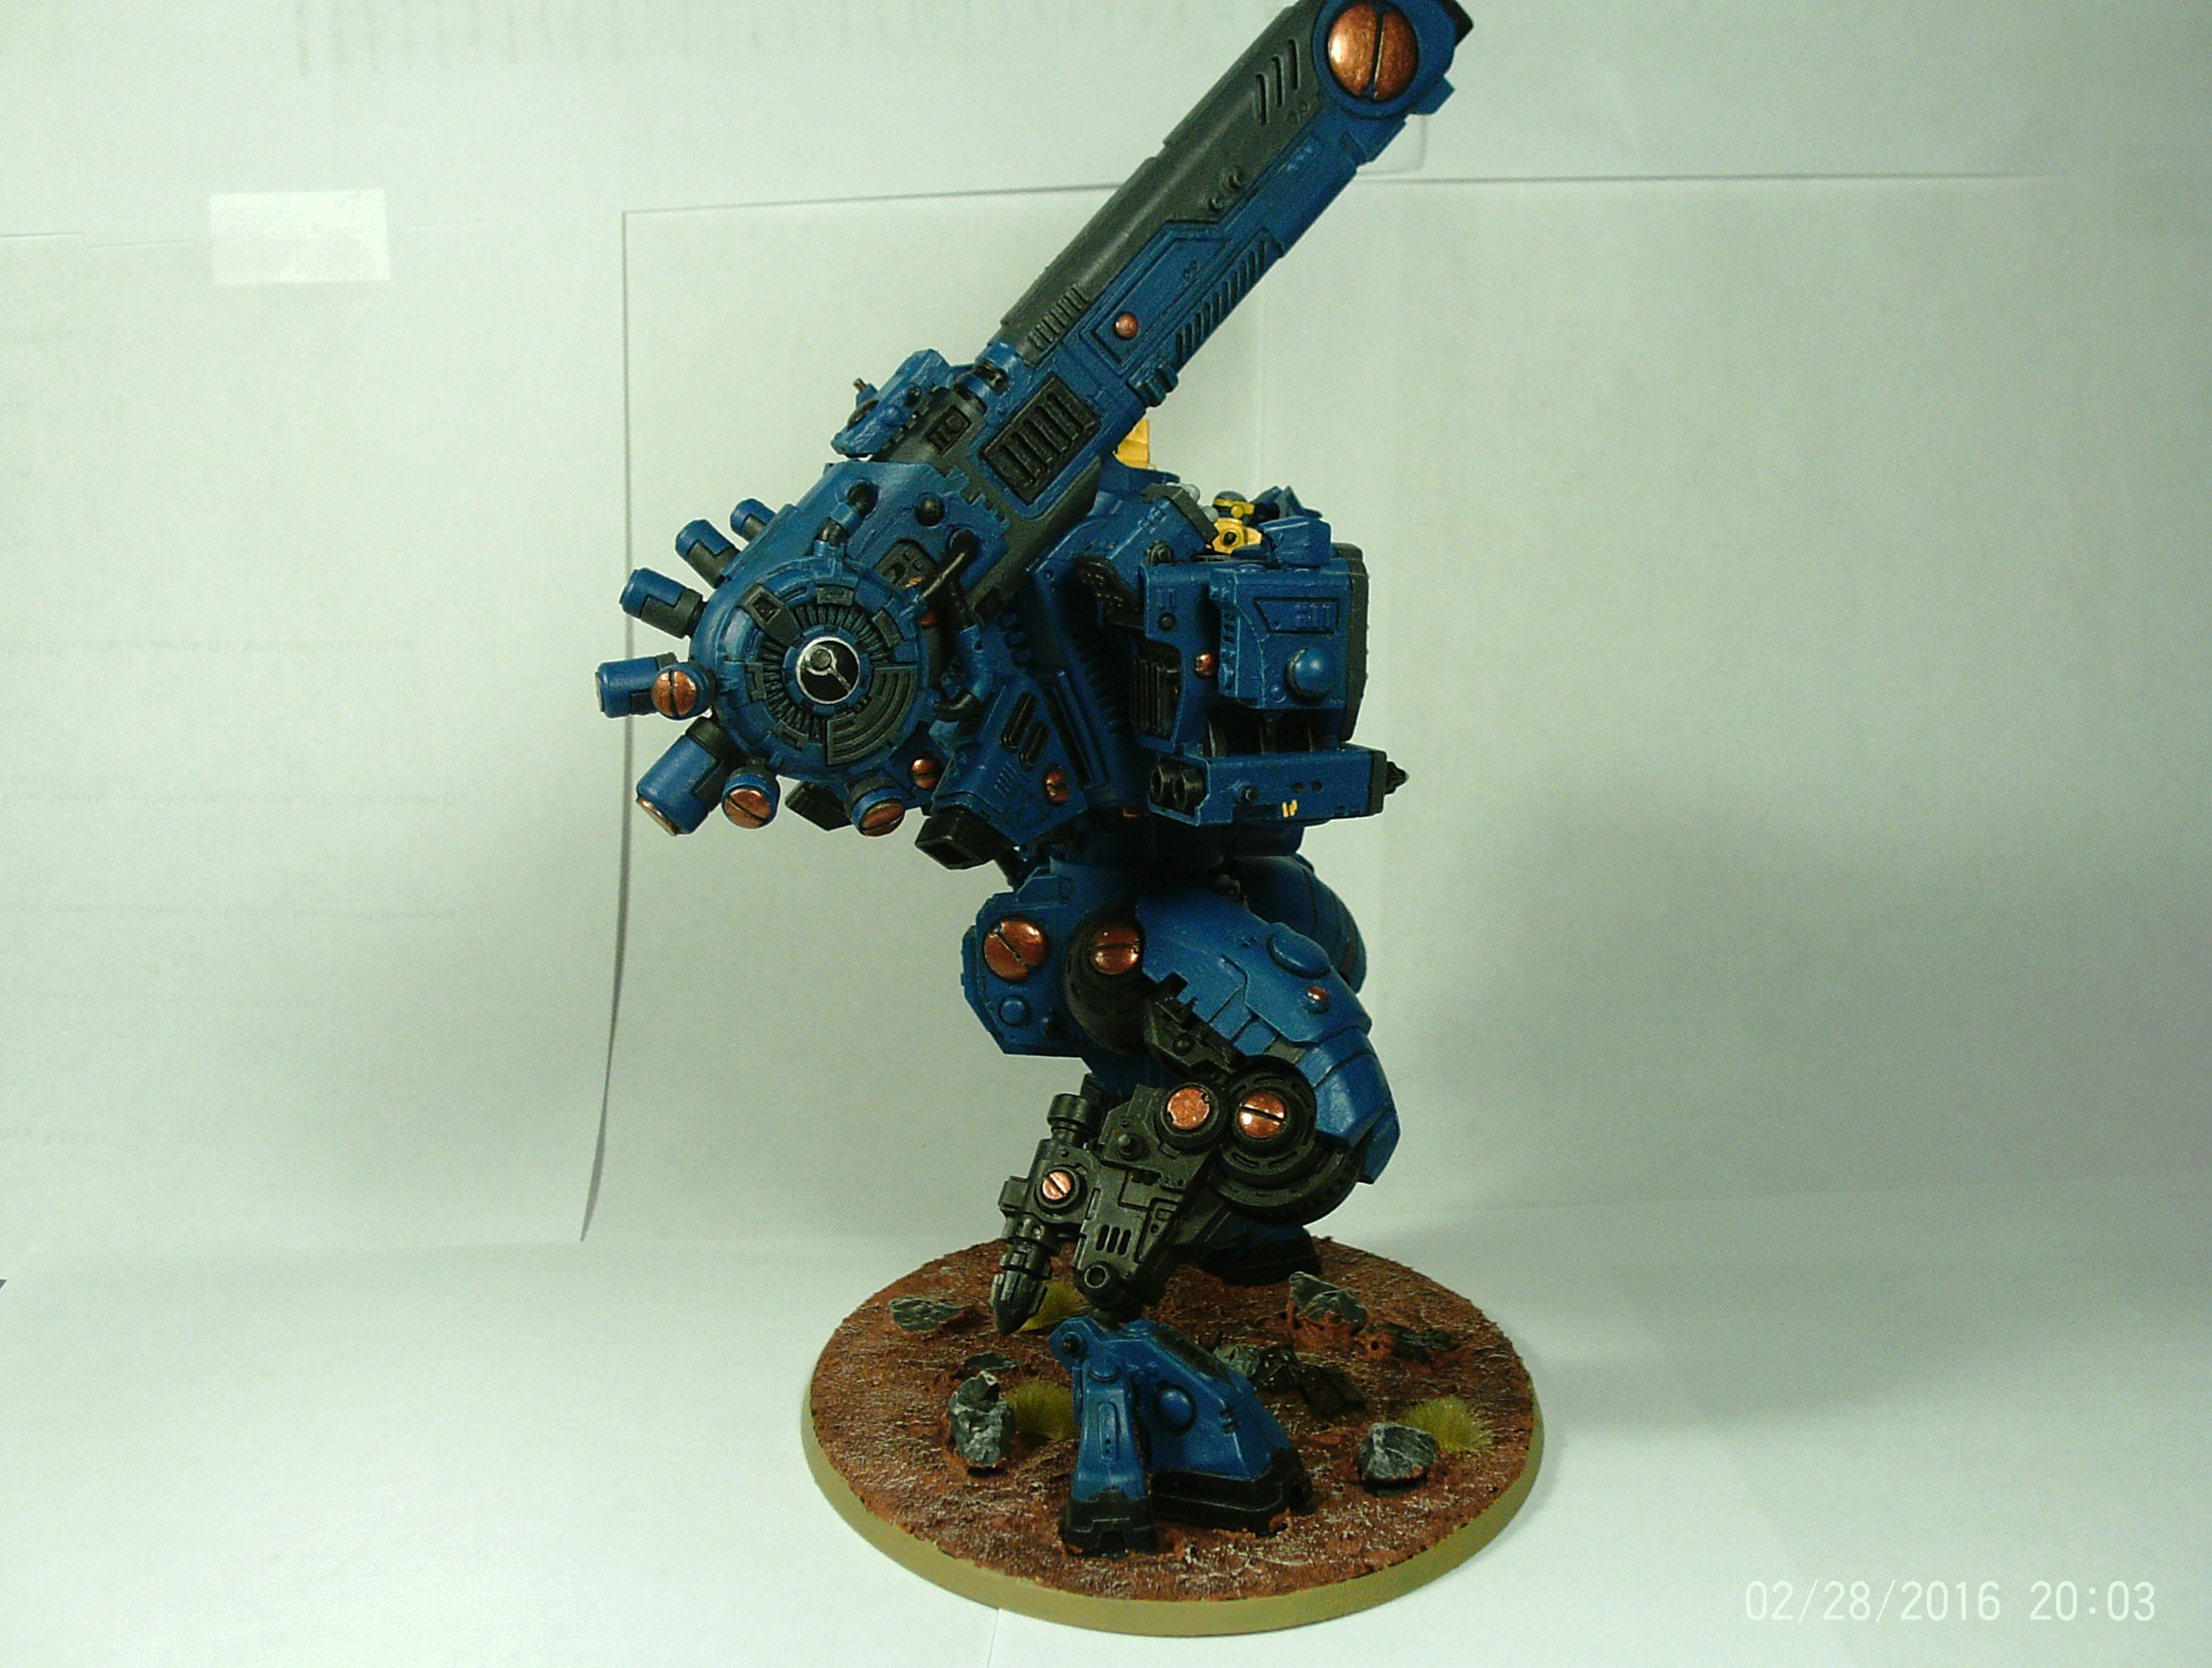 Ballistic, Battlesuit, Creature, Gargantuan, Robot, Stomp, Stormsurge, Suit, Tau, Titan